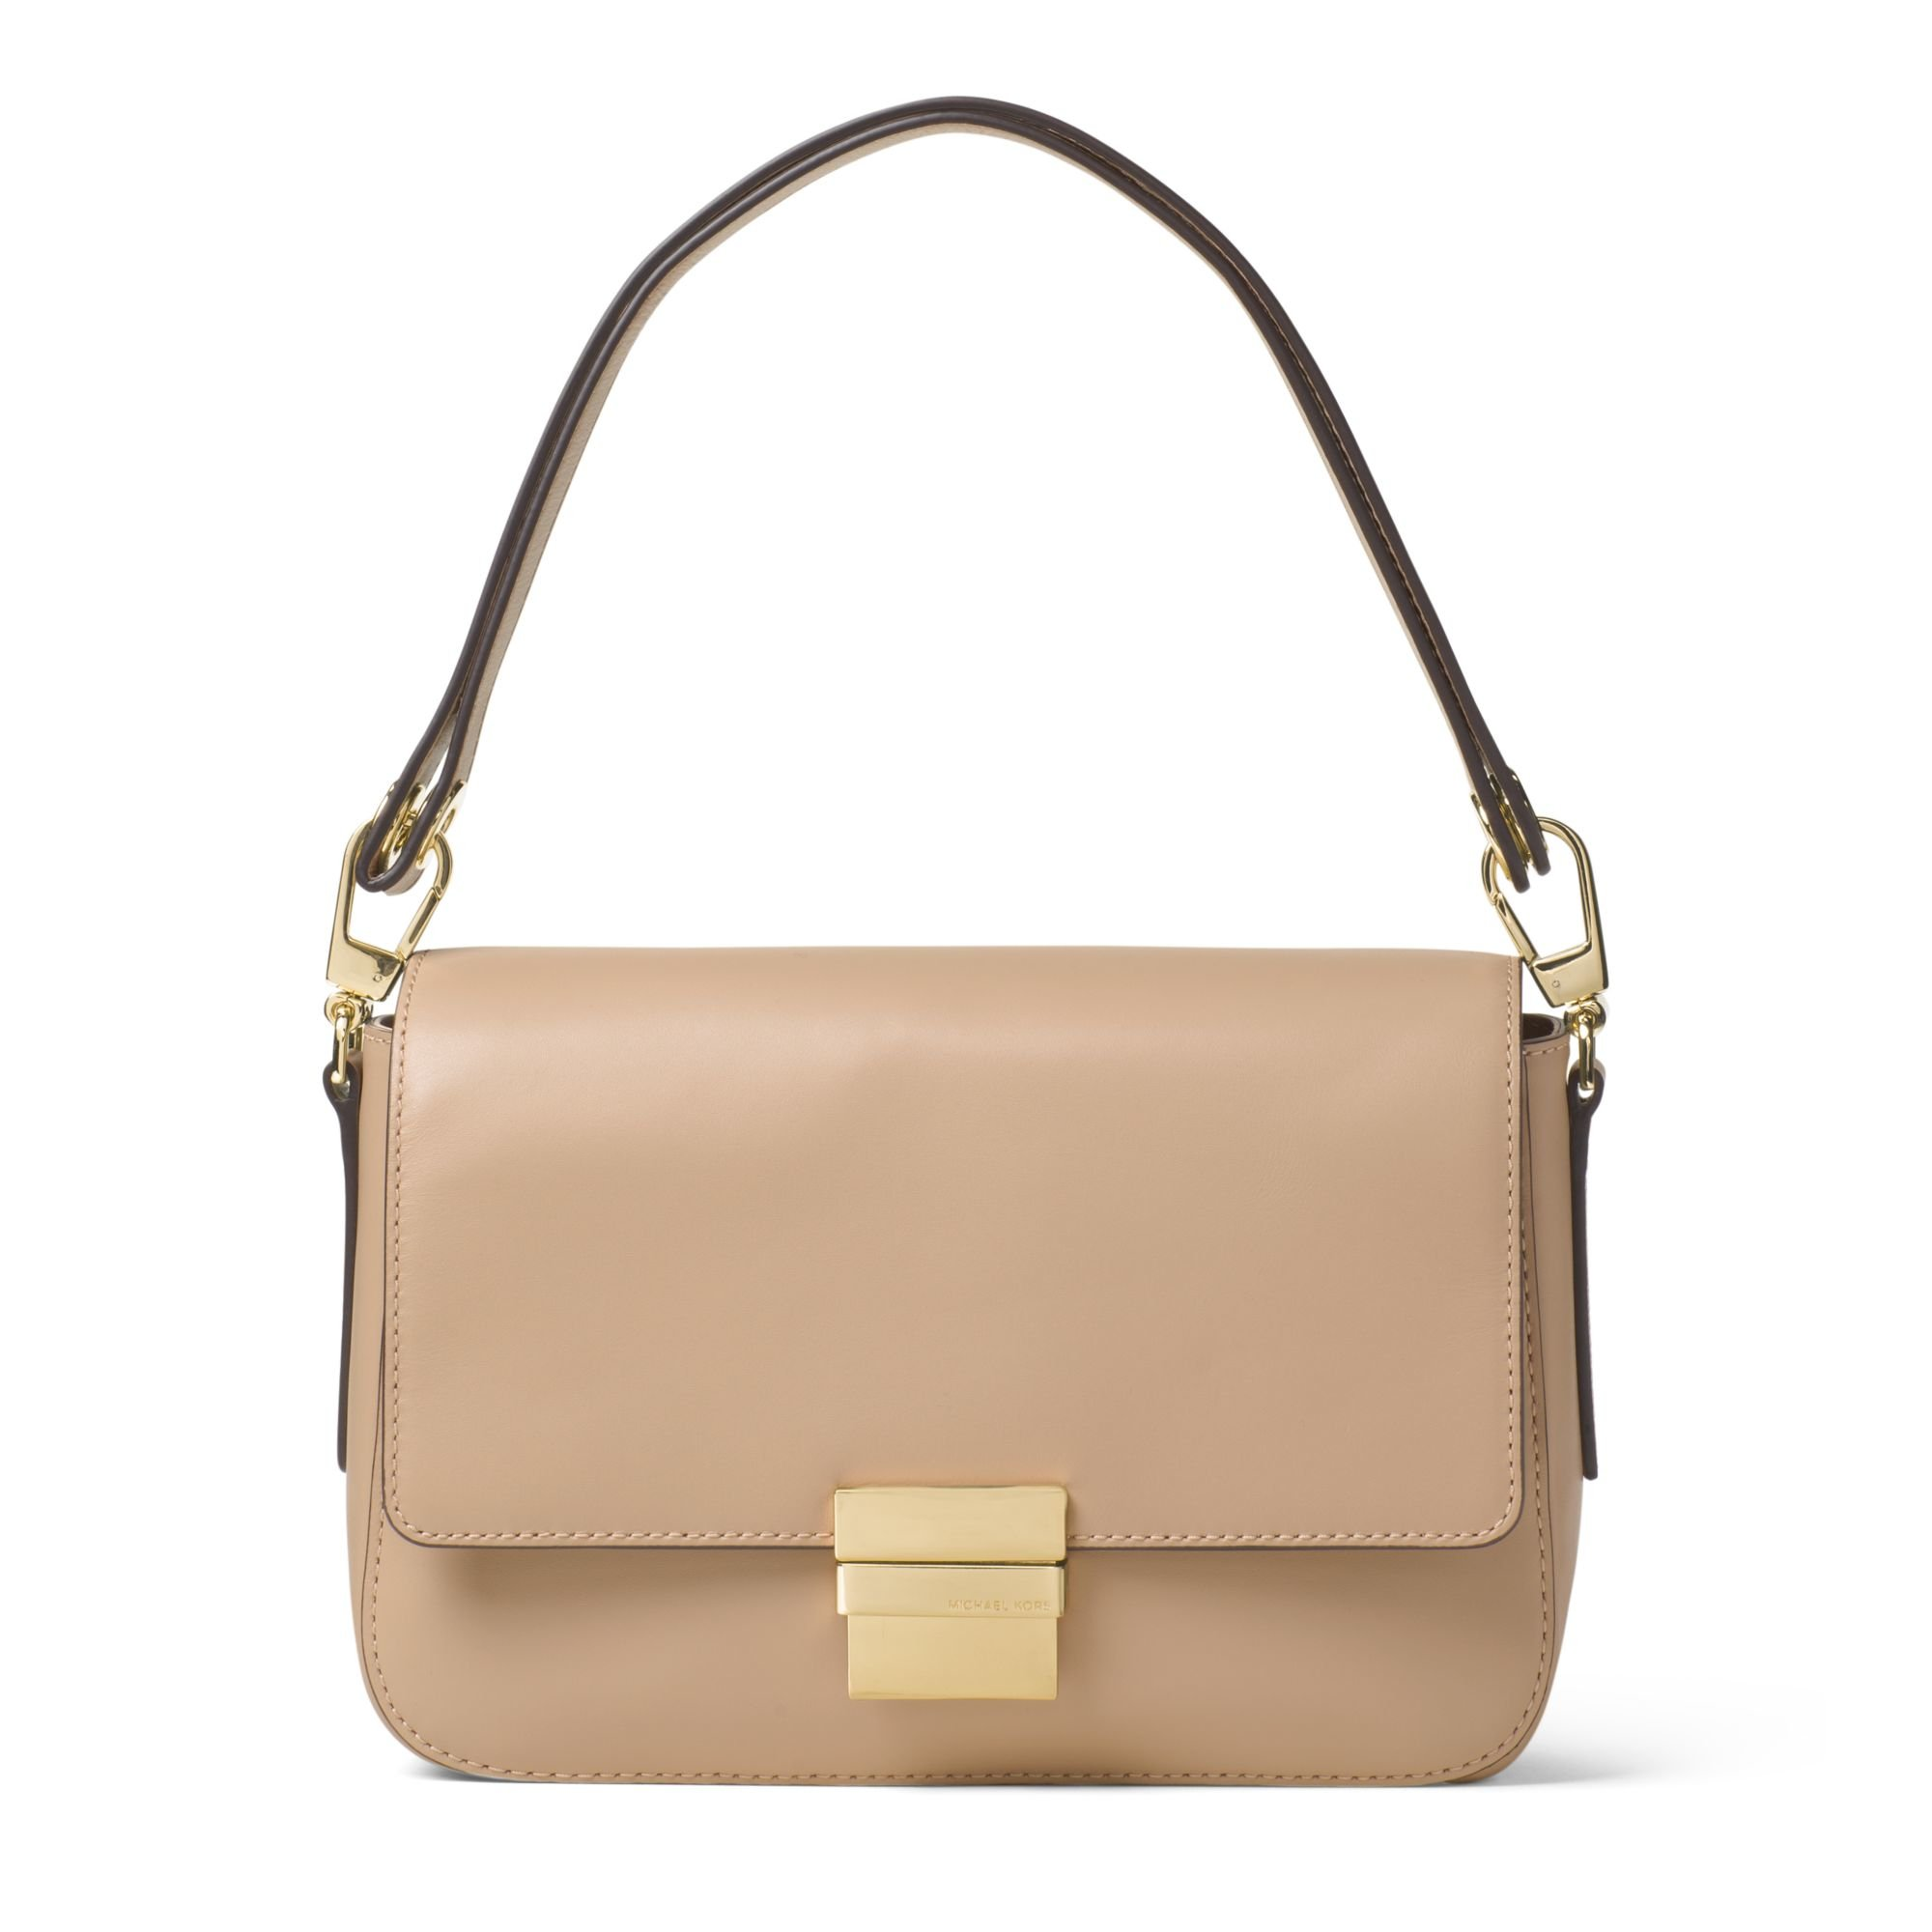 e4fc577831b1 ... white small 95589 aa79d; order michael kors madelyn large leather  shoulder bag in natural lyst fd2dc 2af26